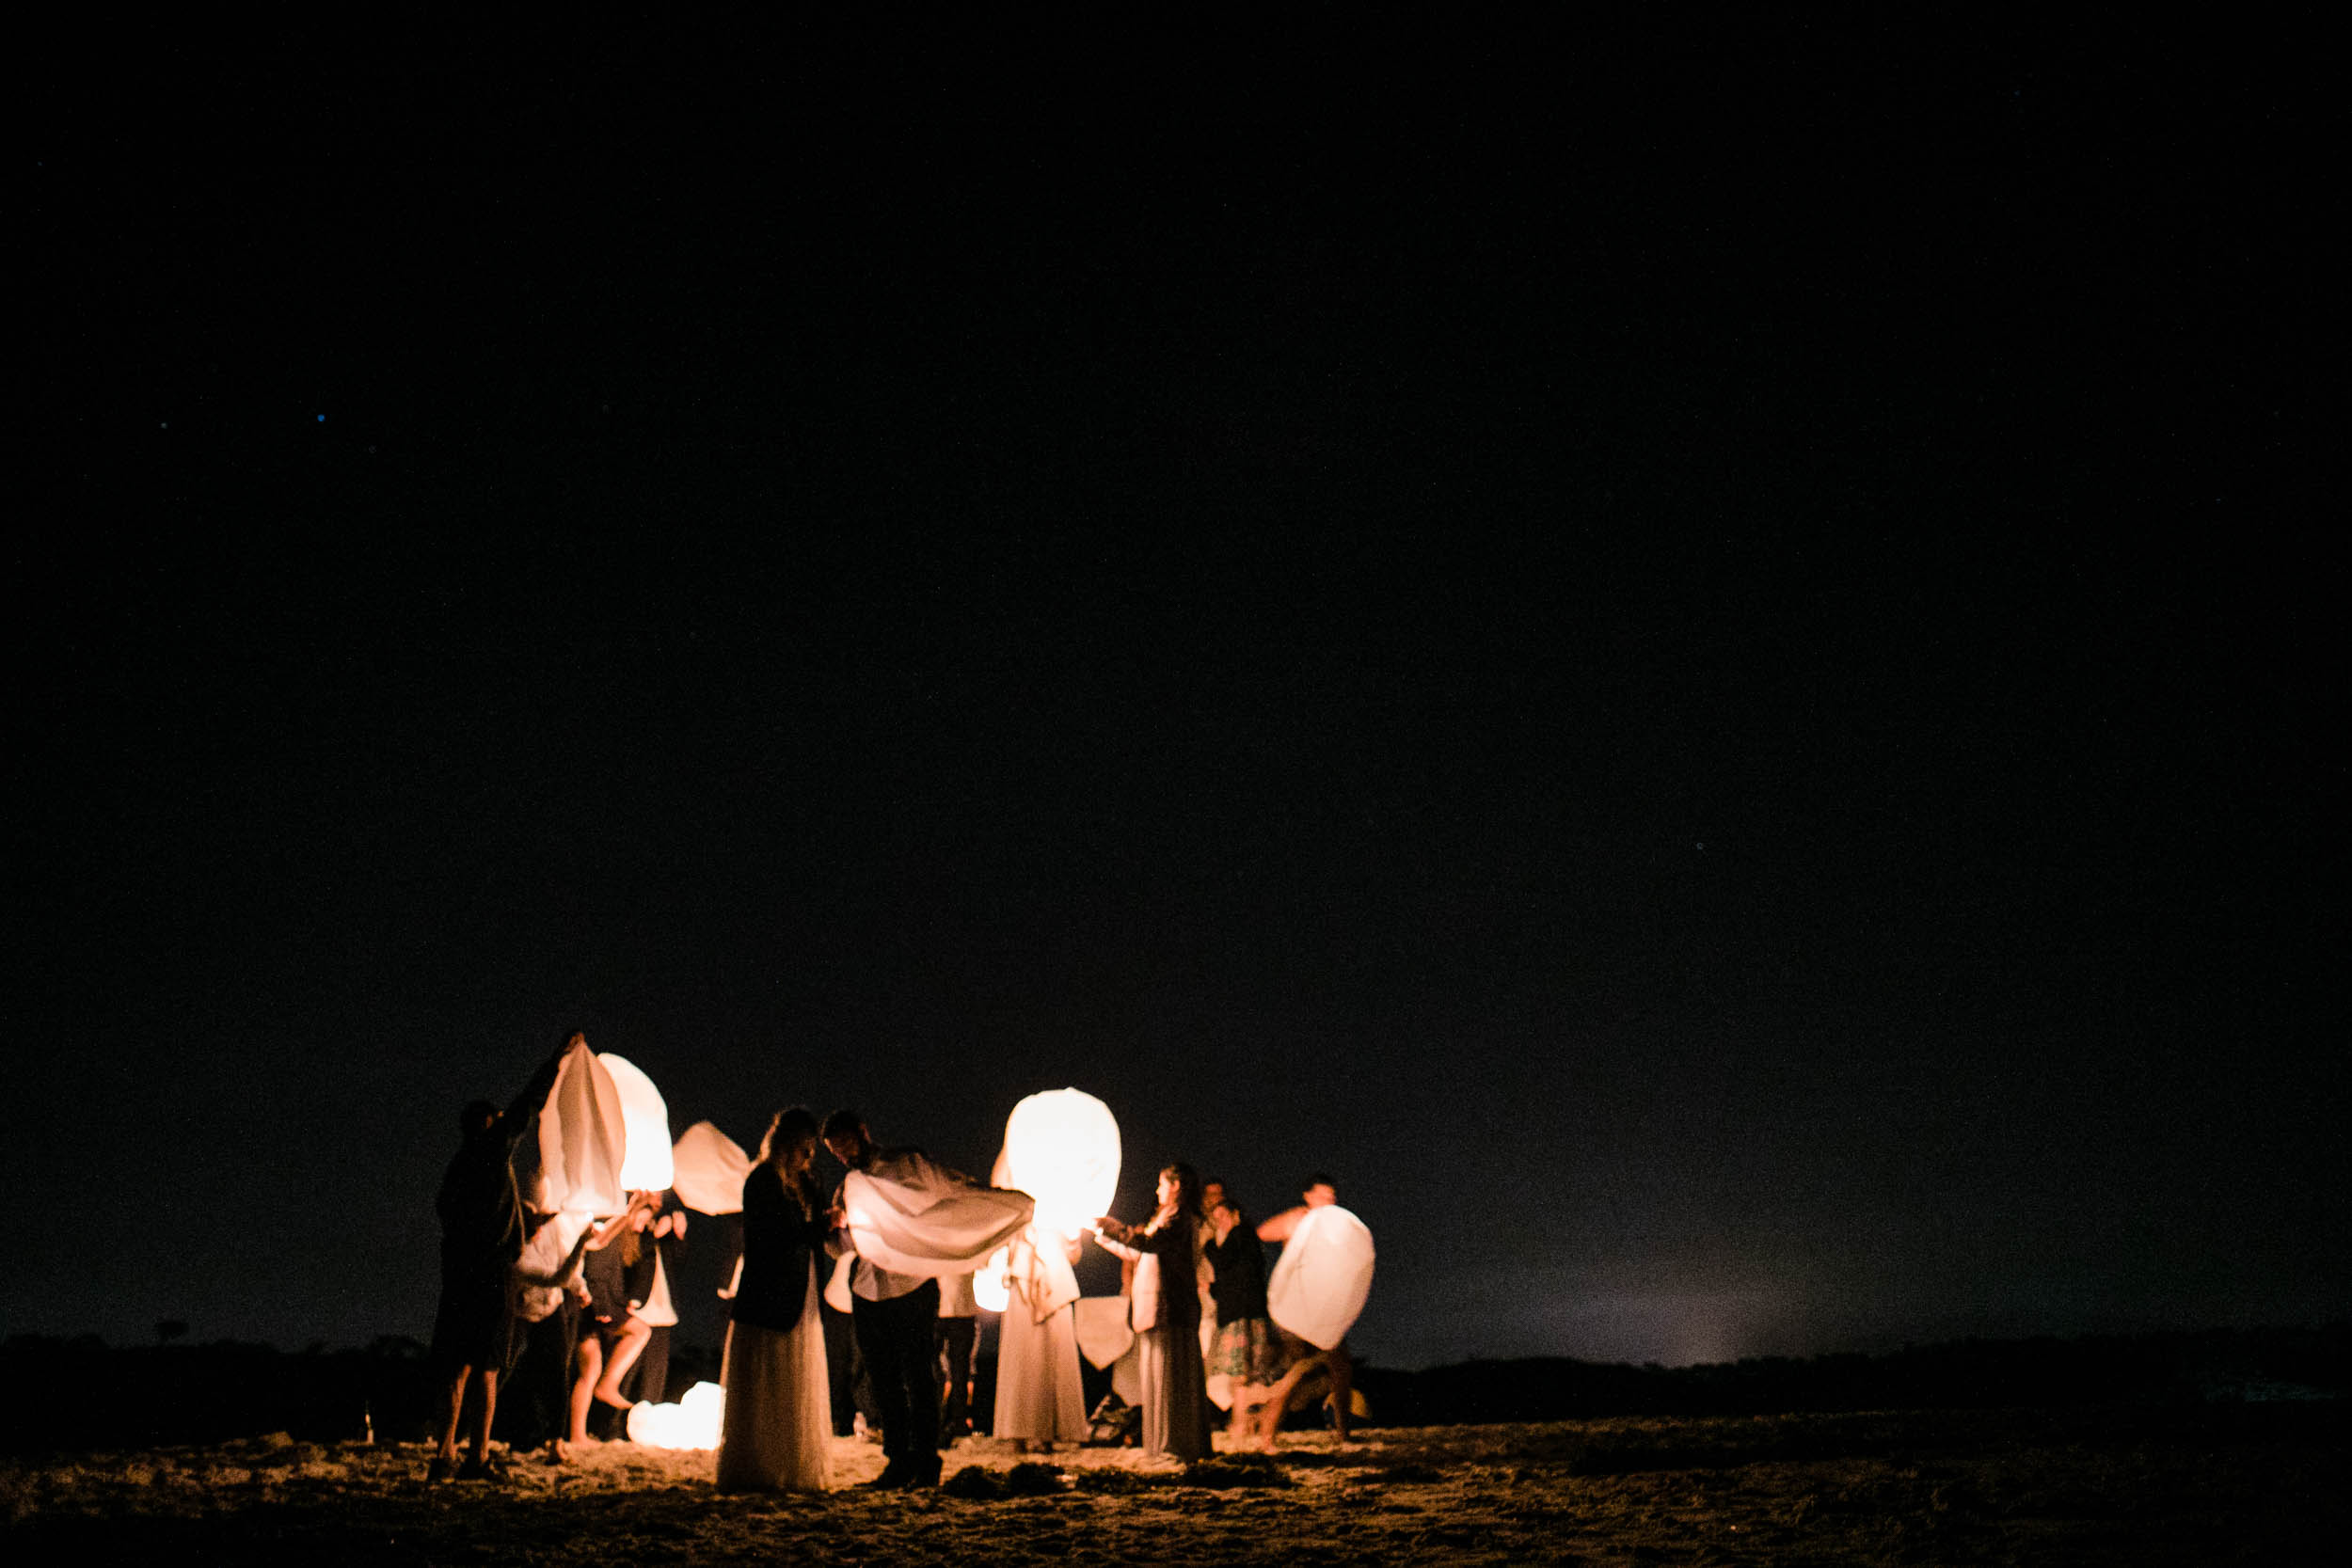 082617_C+K_Asilomar Pacific Grove Wedding_Buena Lane Photography_3618ER.jpg